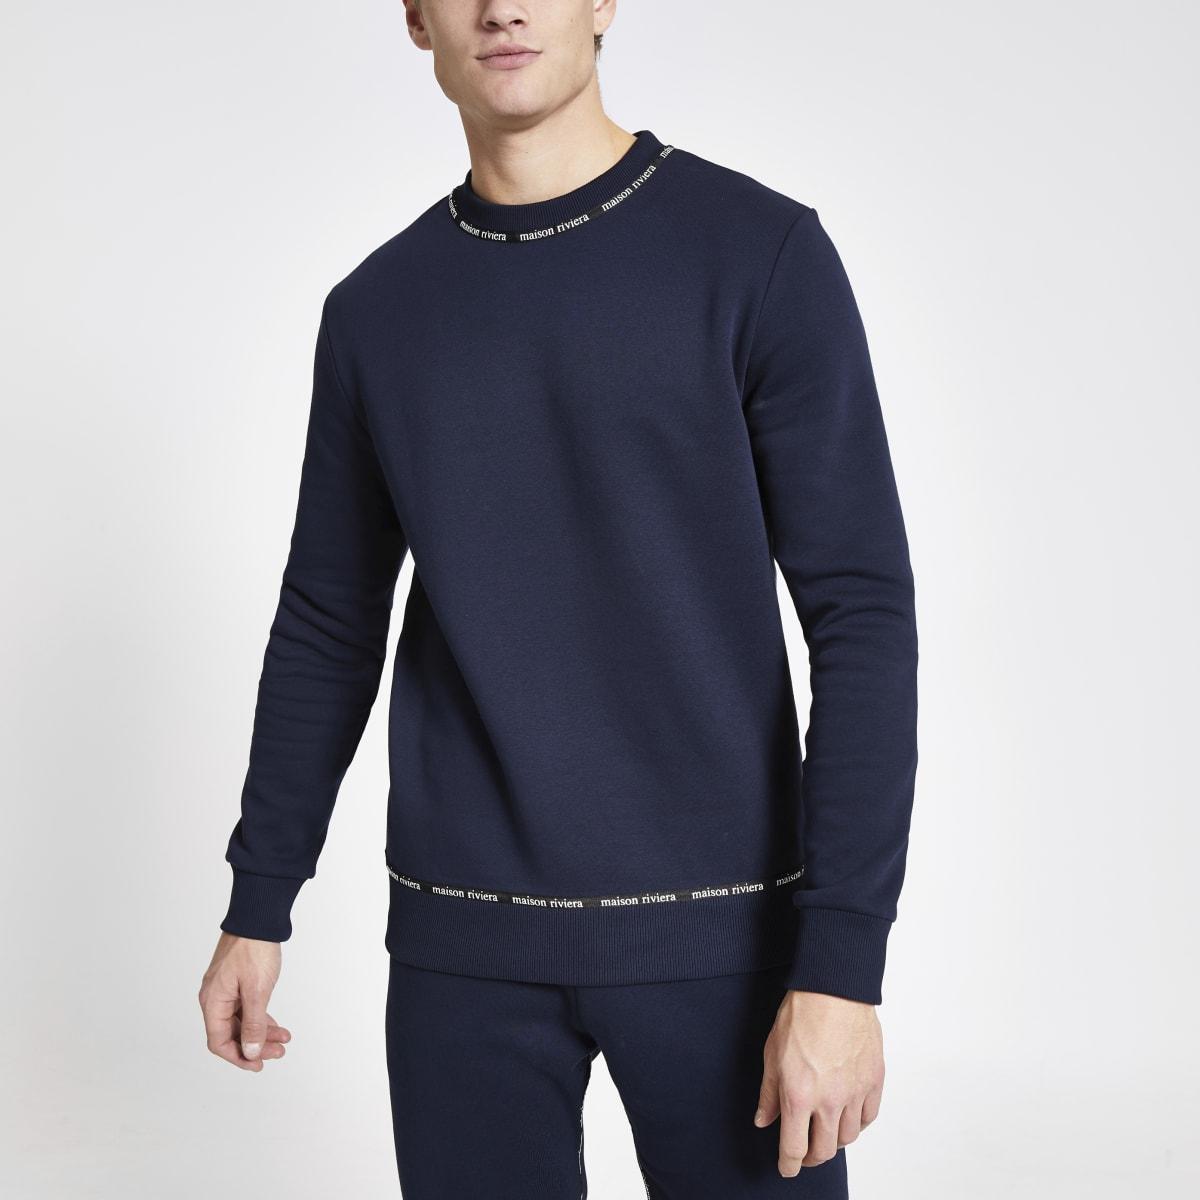 Maison Riviera navy tape slim fit sweatshirt